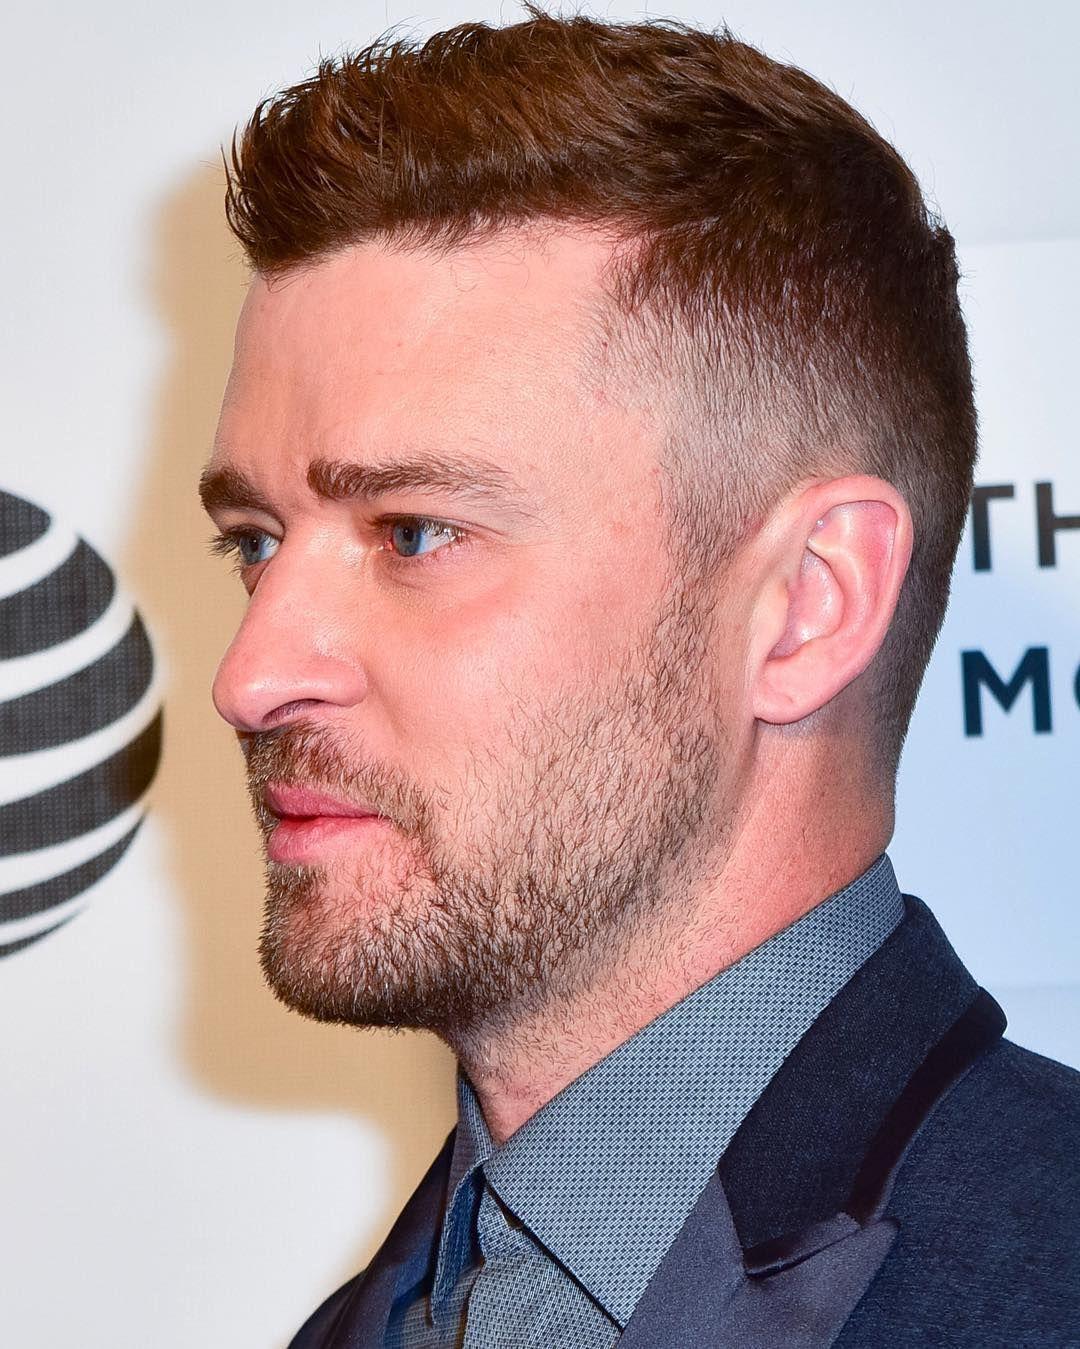 Cool 45 Popular Justin Timberlake S Haircuts Revolutionary Style Check More At Http Machohairstyles Com Best Haircuts For Men Mens Hairstyles Cool Haircuts